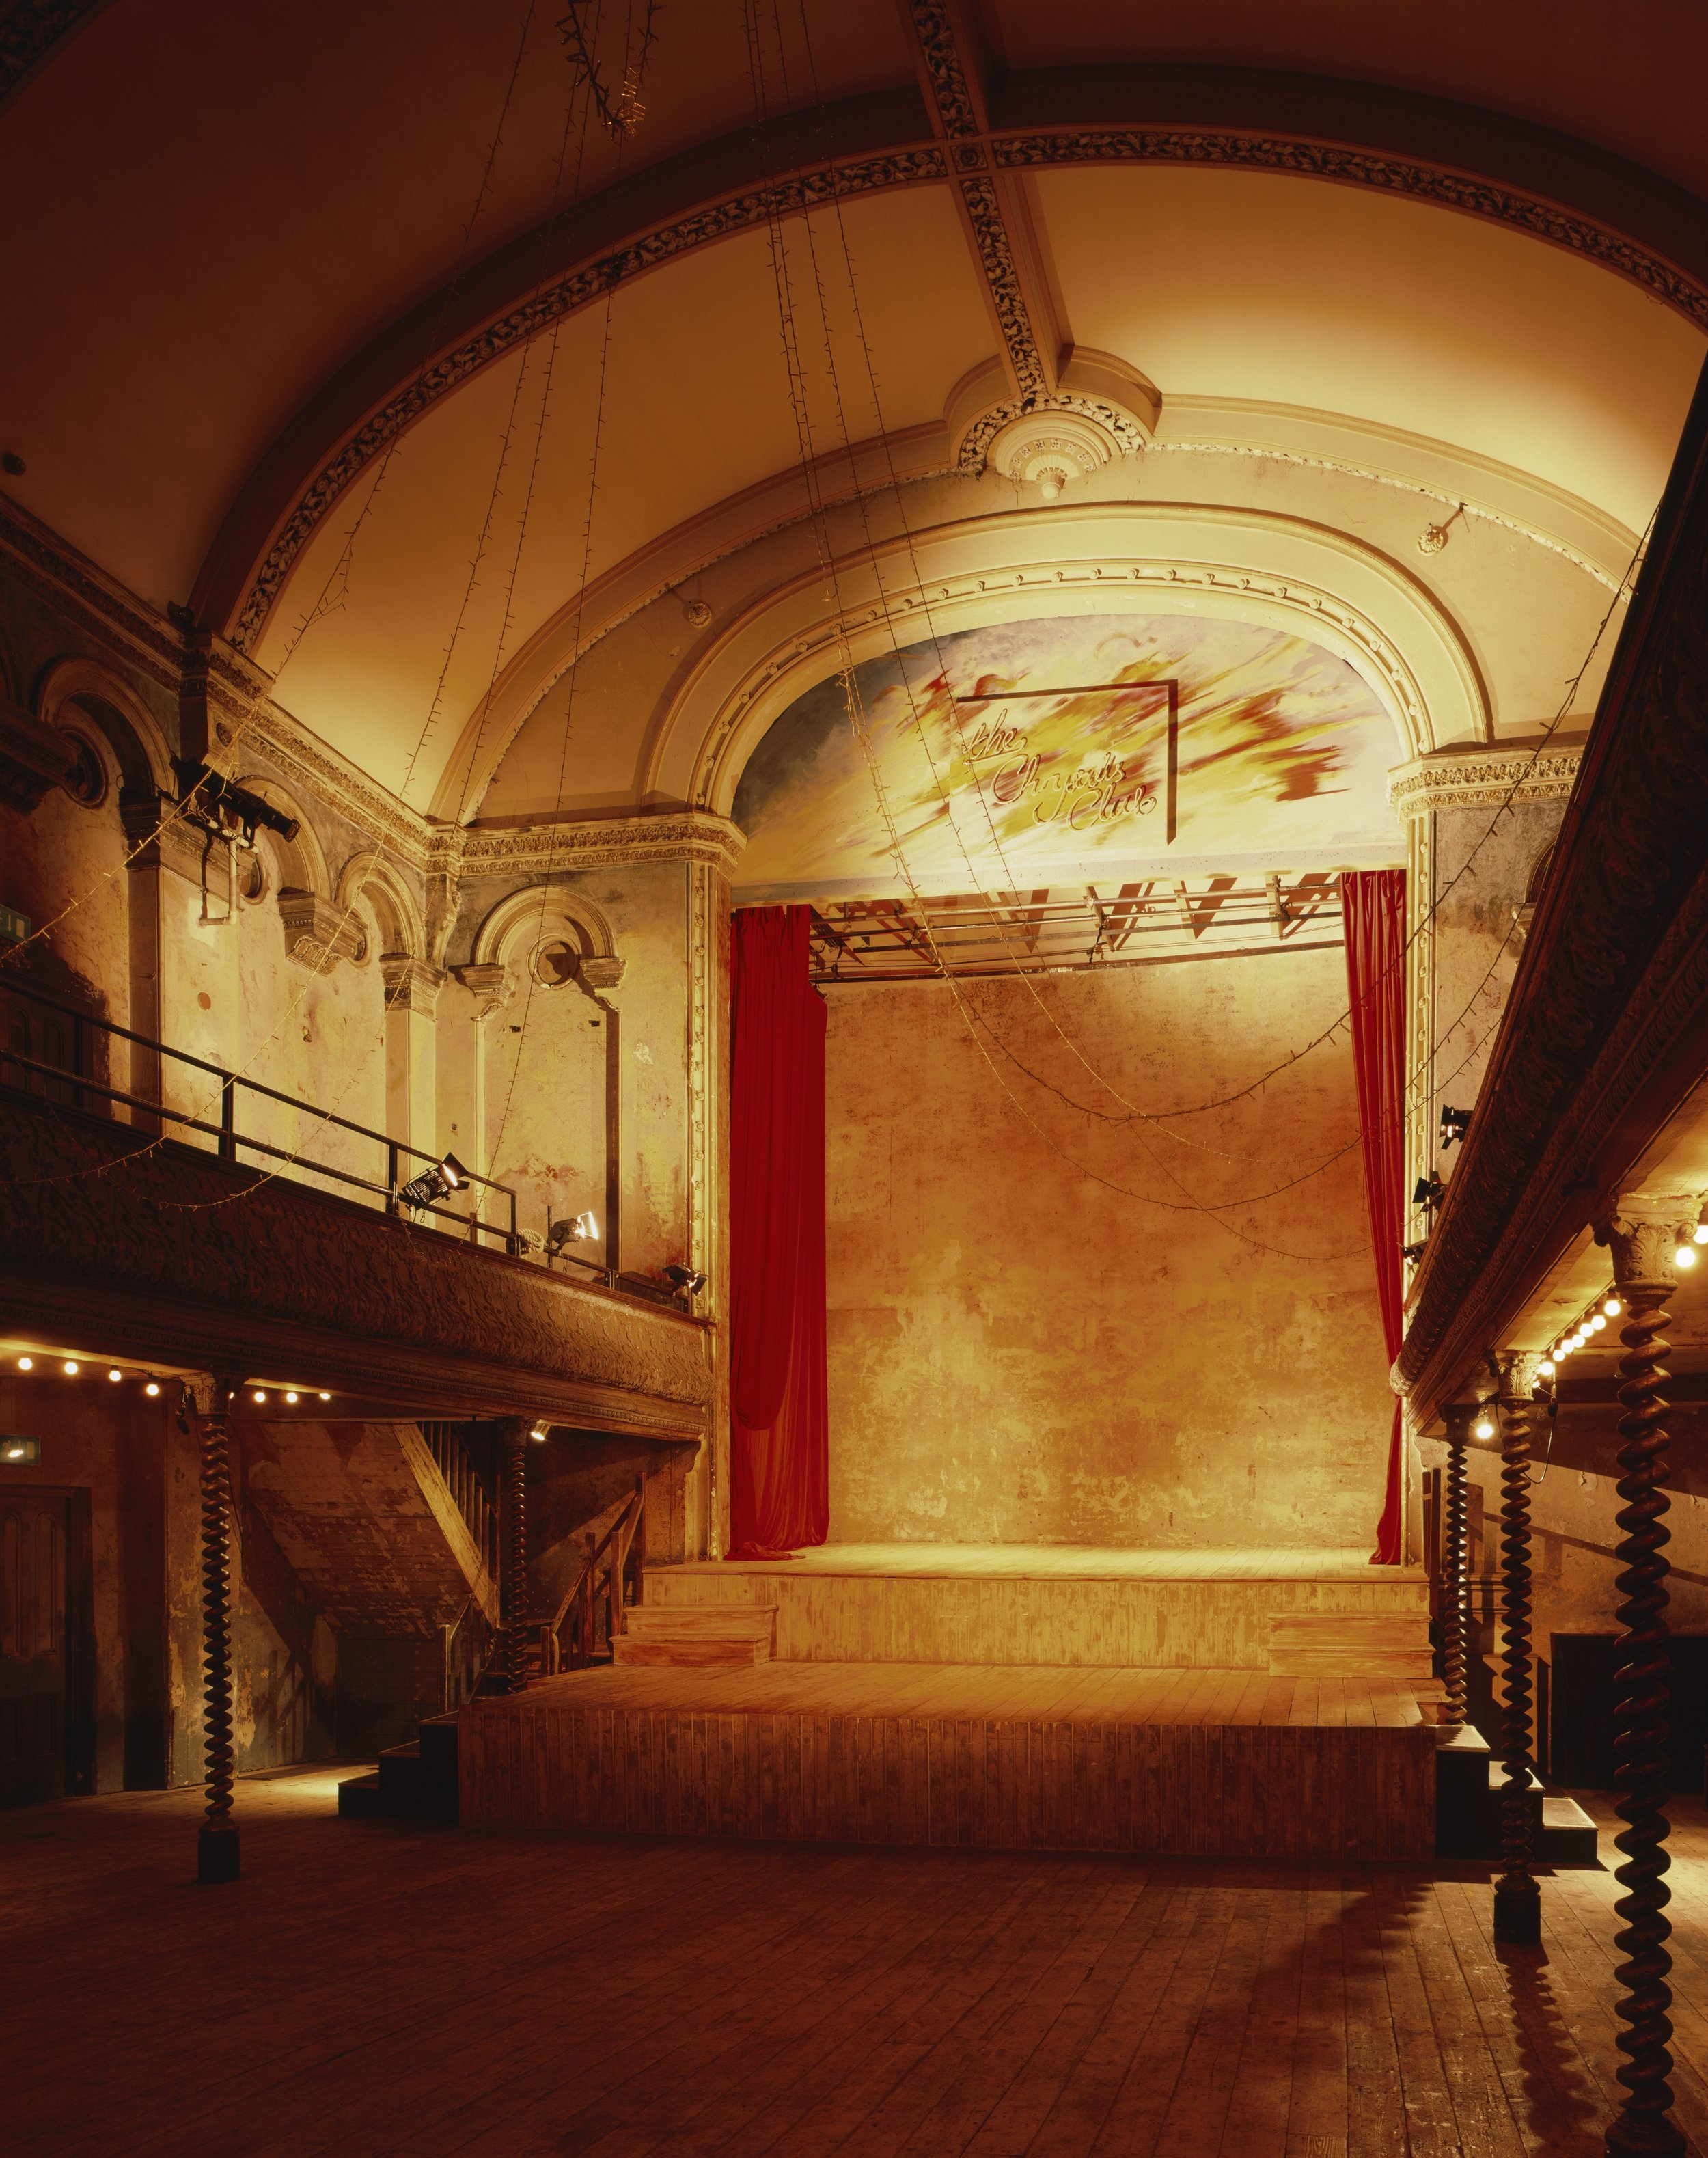 Wiltons-Music-Hall.-Credit-Helene-Binet-9.jpg